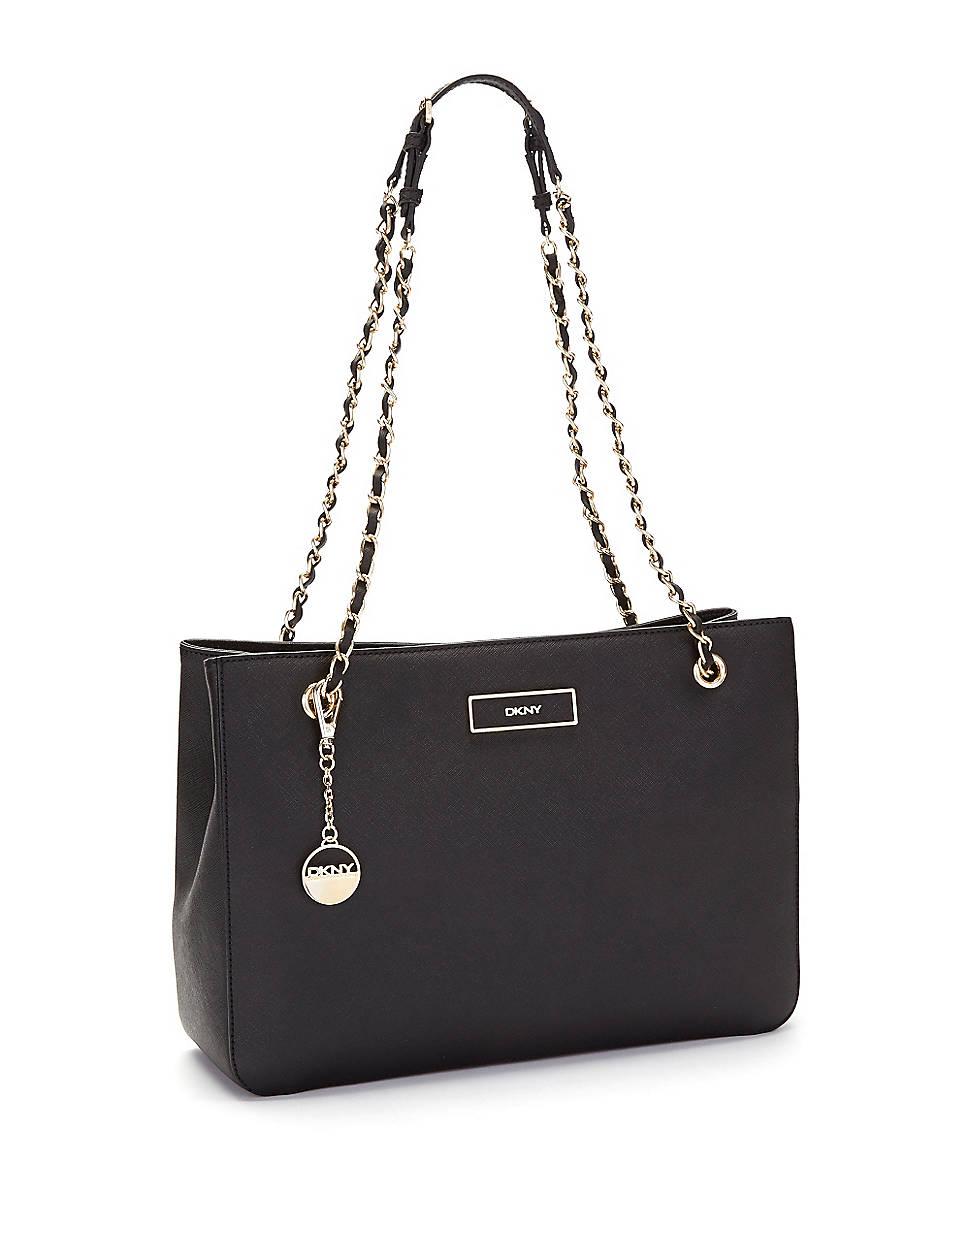 ralph lauren handbags 2013 tote in black leather male